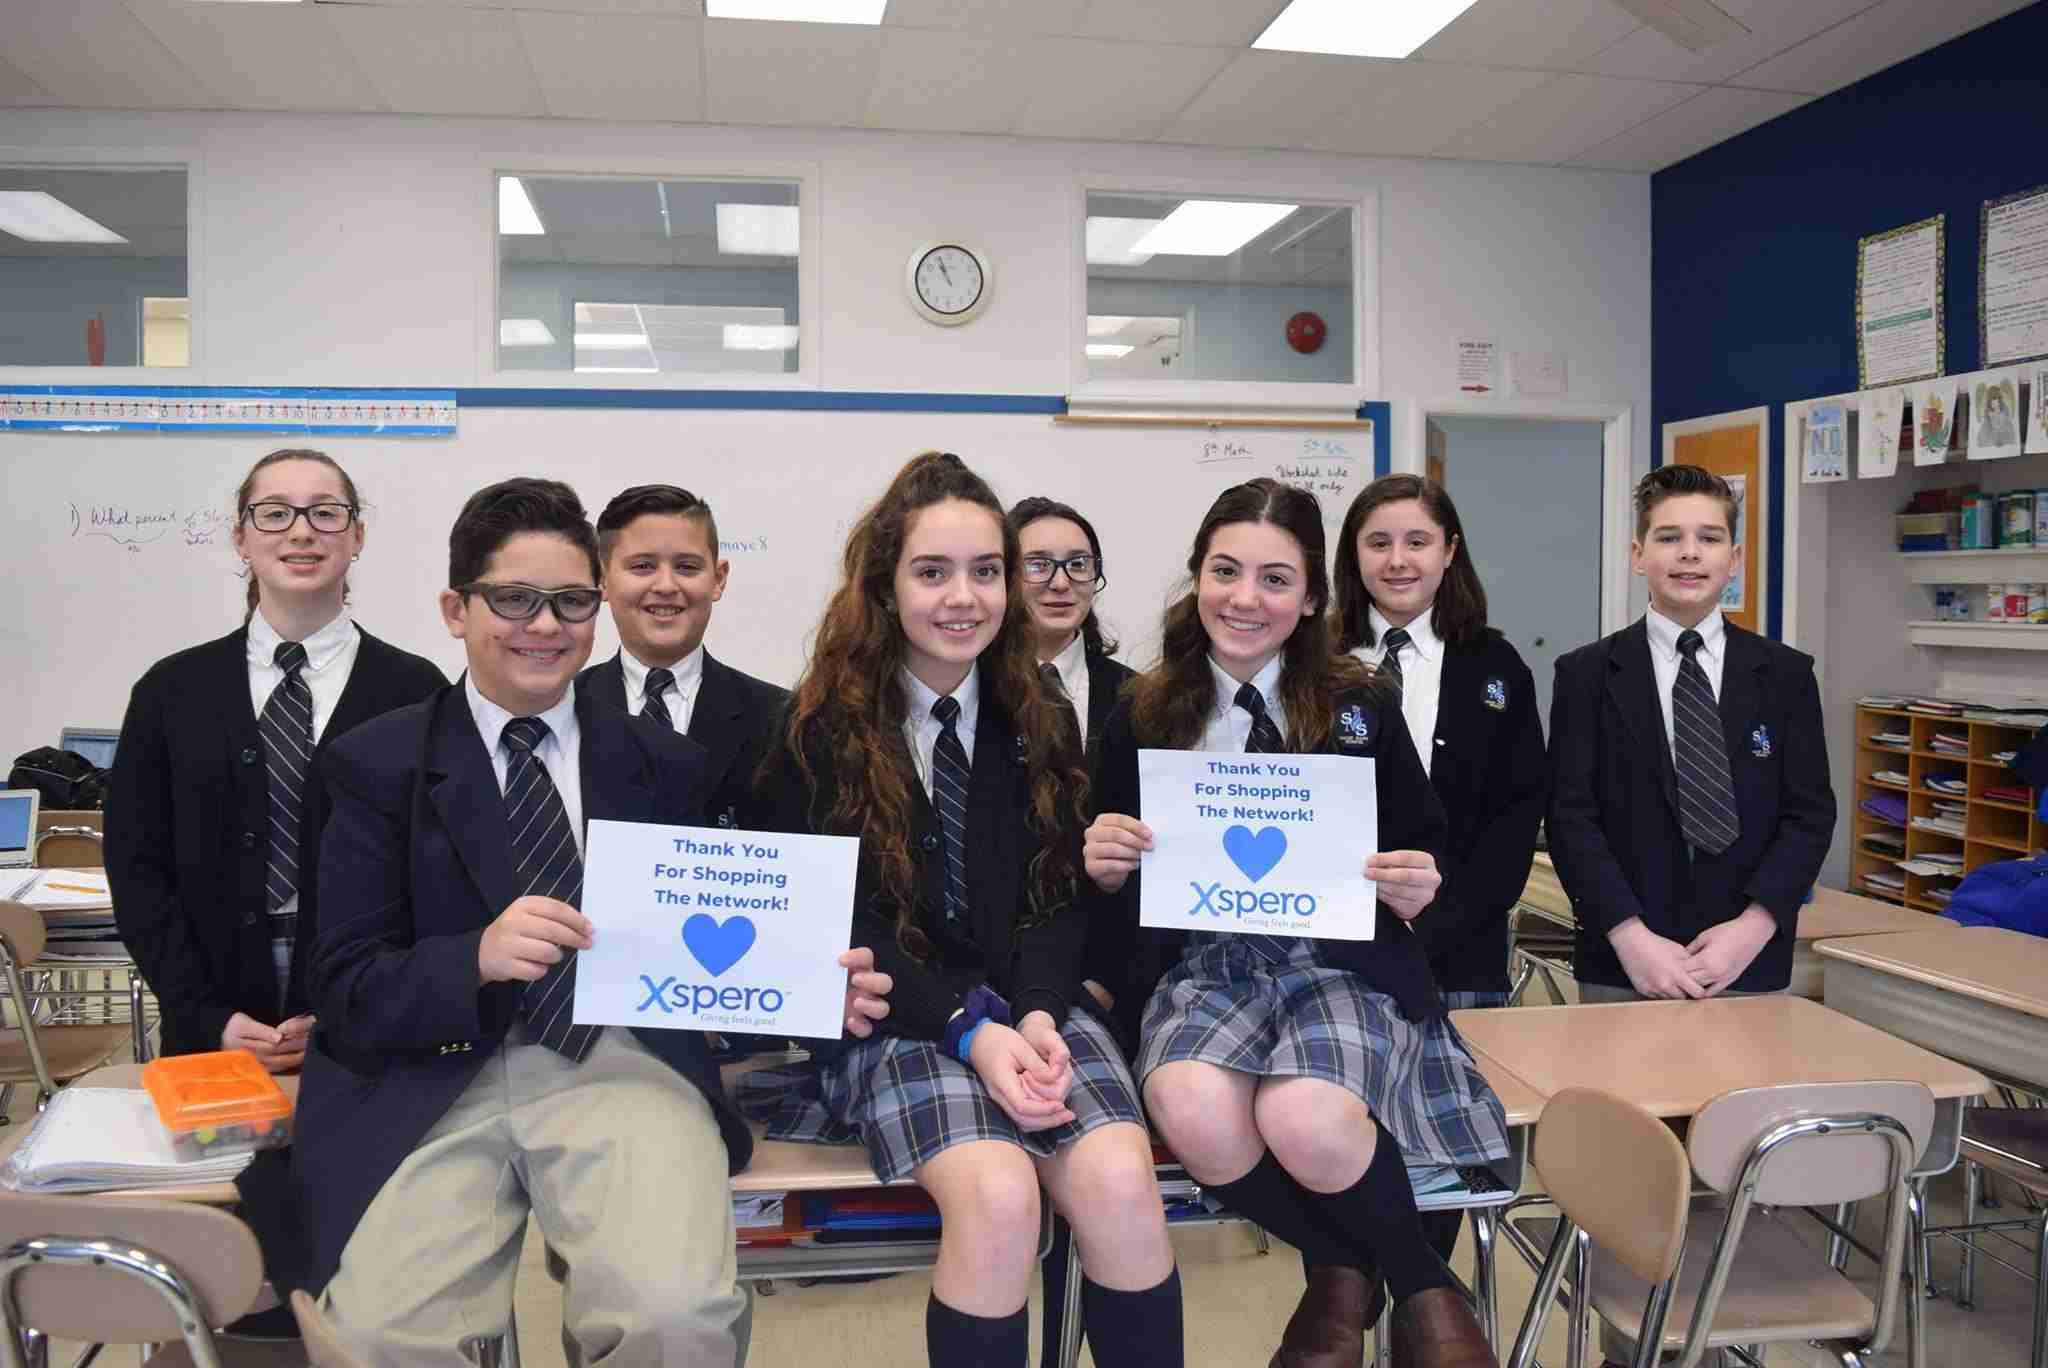 St. Mary School Wins Twice with the Xspero™ App